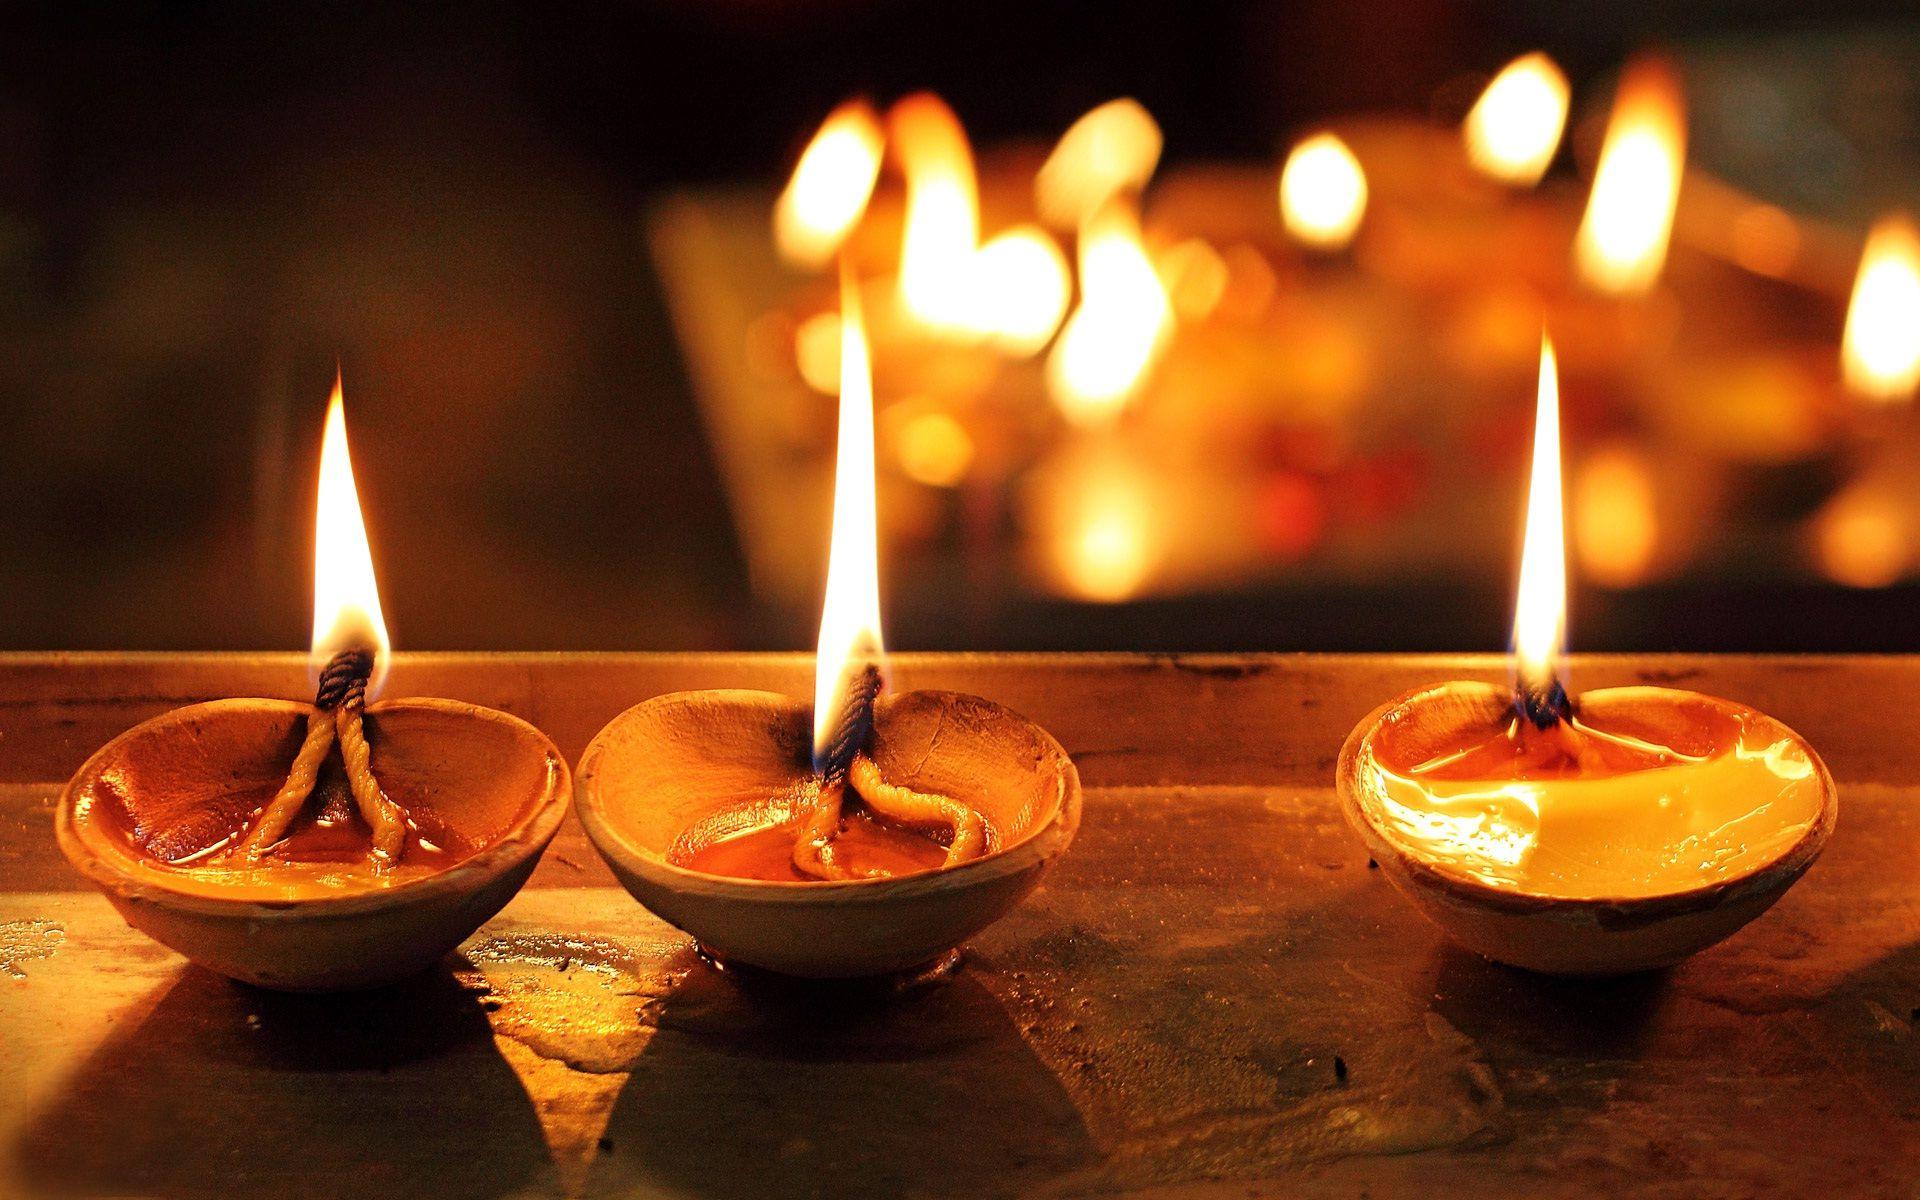 Diwali-lights-Diya-wallpaper.jpg   Yoga   Pinterest   Yoga for diwali lamps wallpaper  195sfw